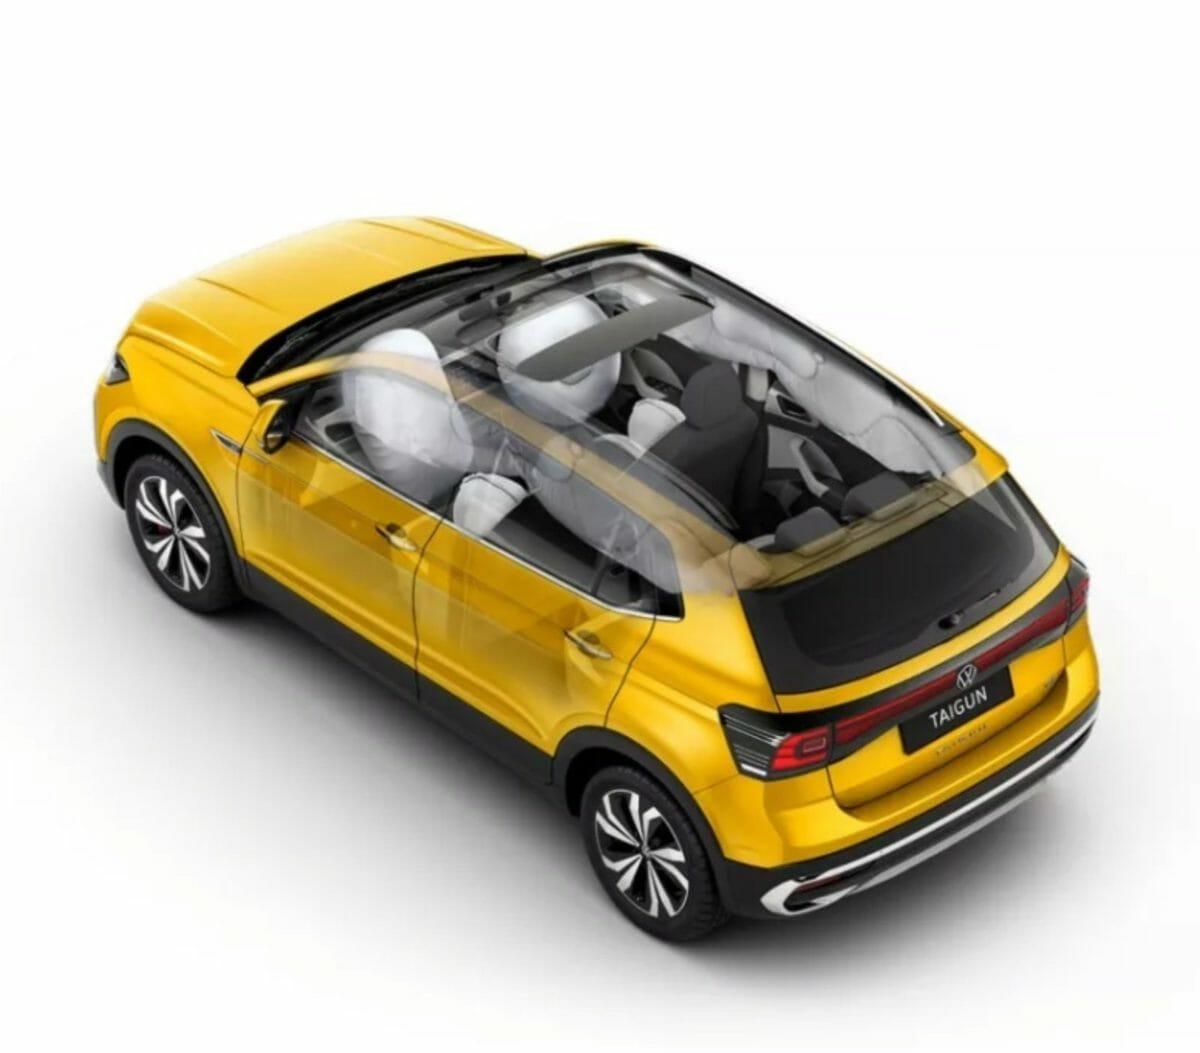 vw taigun airbags